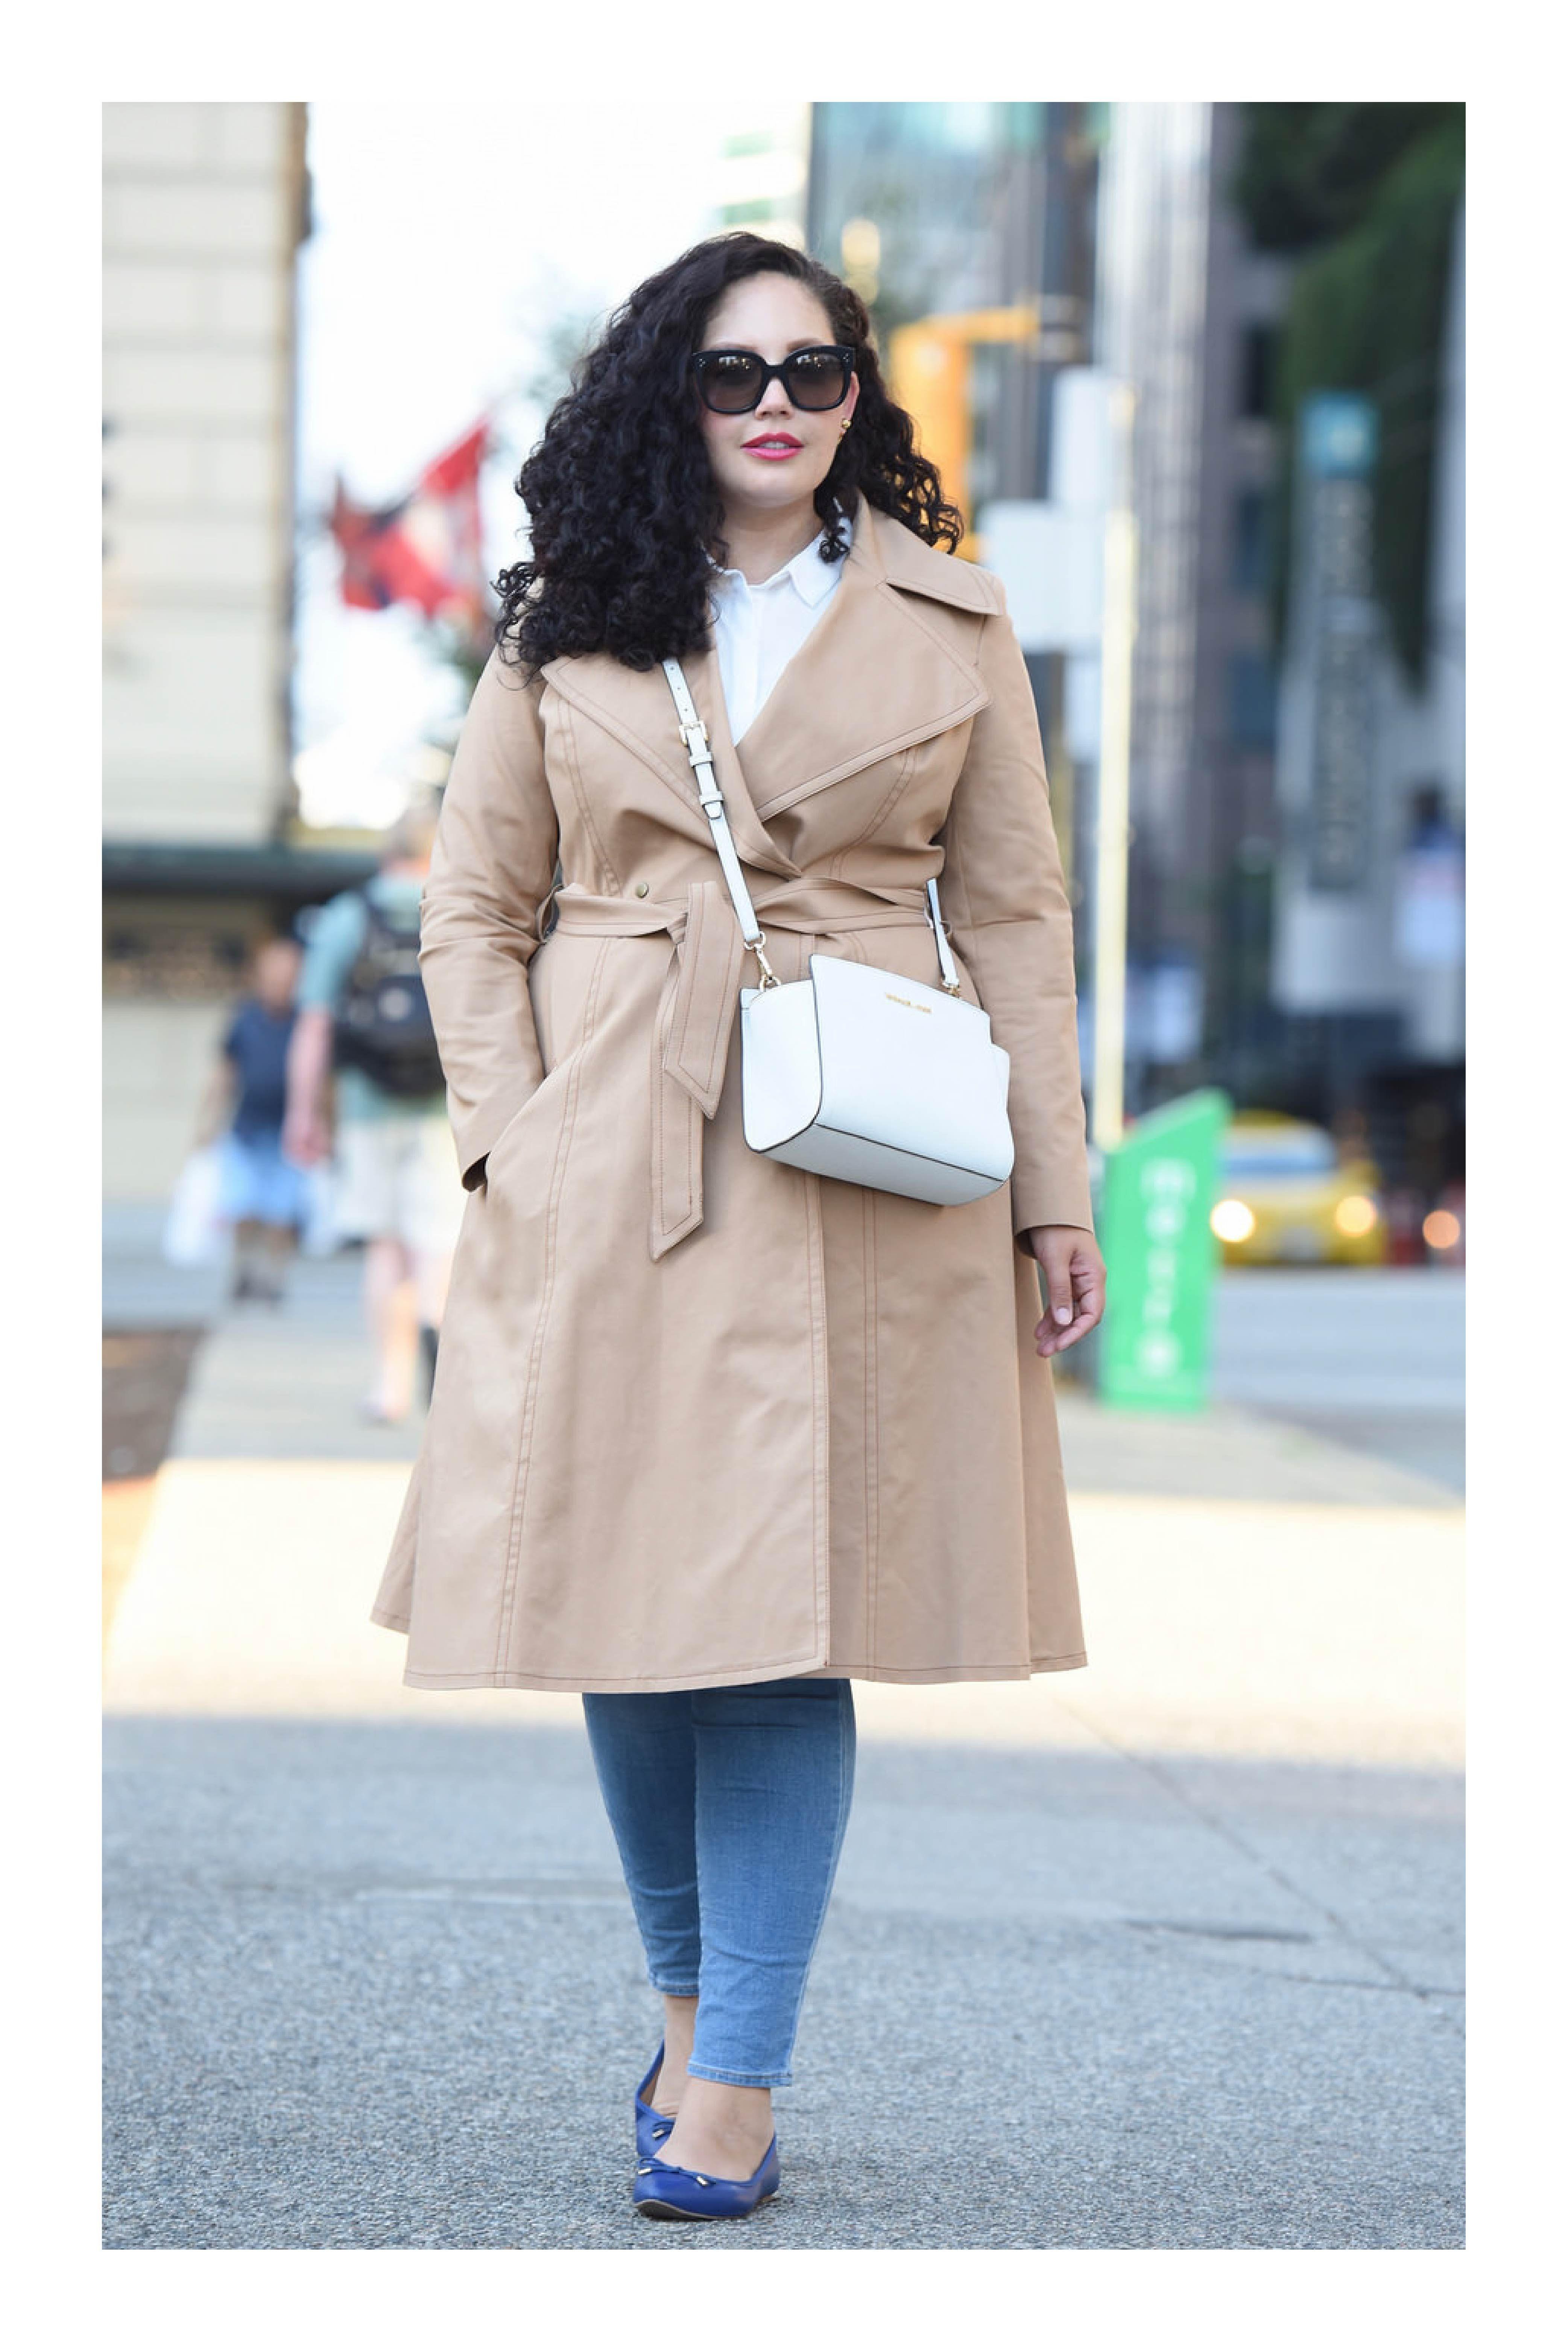 Tipos de calzado que necesitas en tu armario para combinar cualquier outfit   TiZKKAmoda  abrigo  beige  jeans  denim  flats  azul  lentes  bolsa  blanca f1eca4821a9c